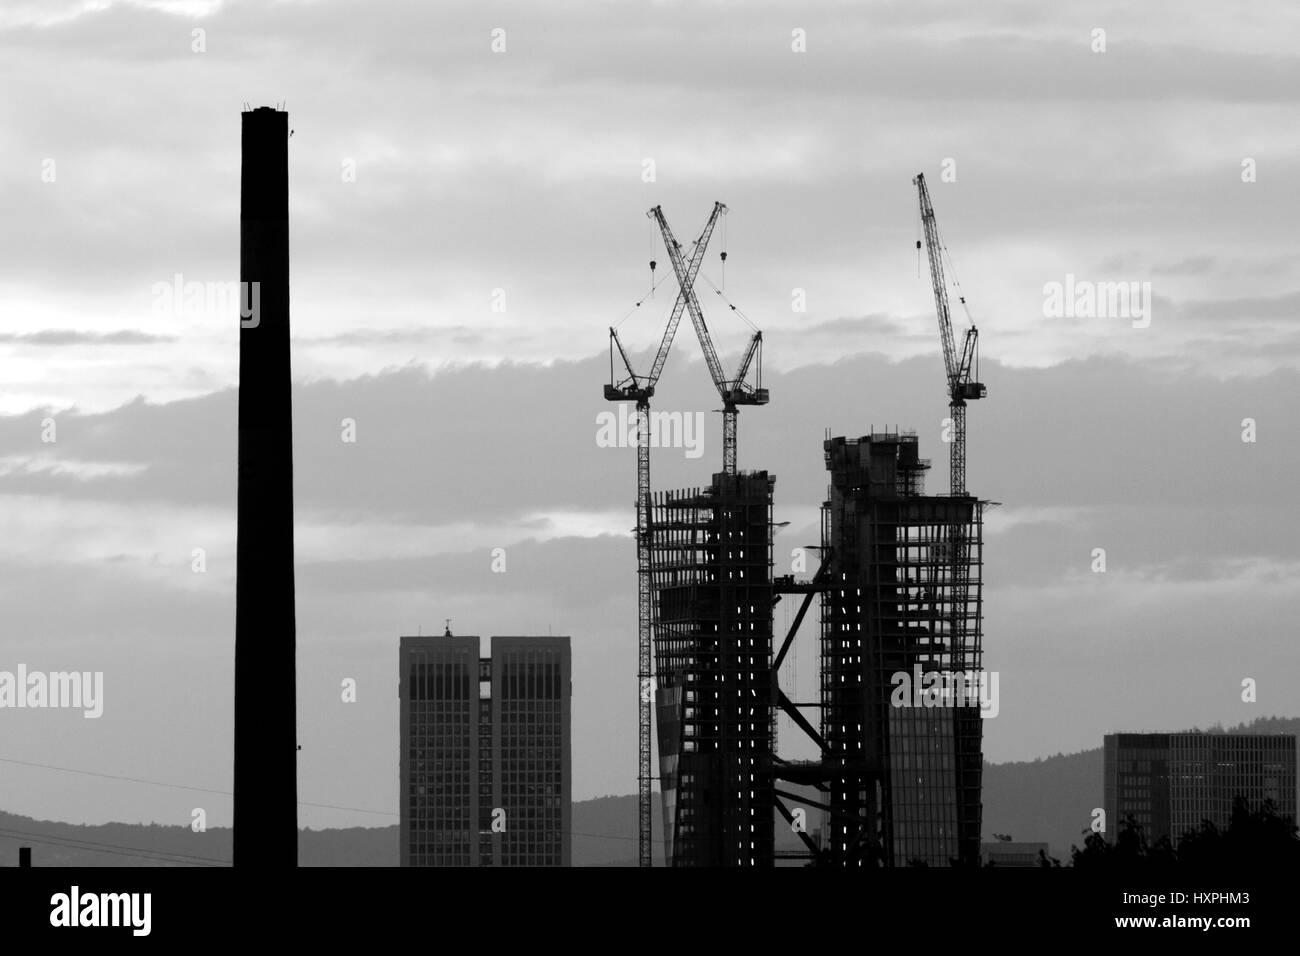 high rises hochhuser stock image - Muster Huser